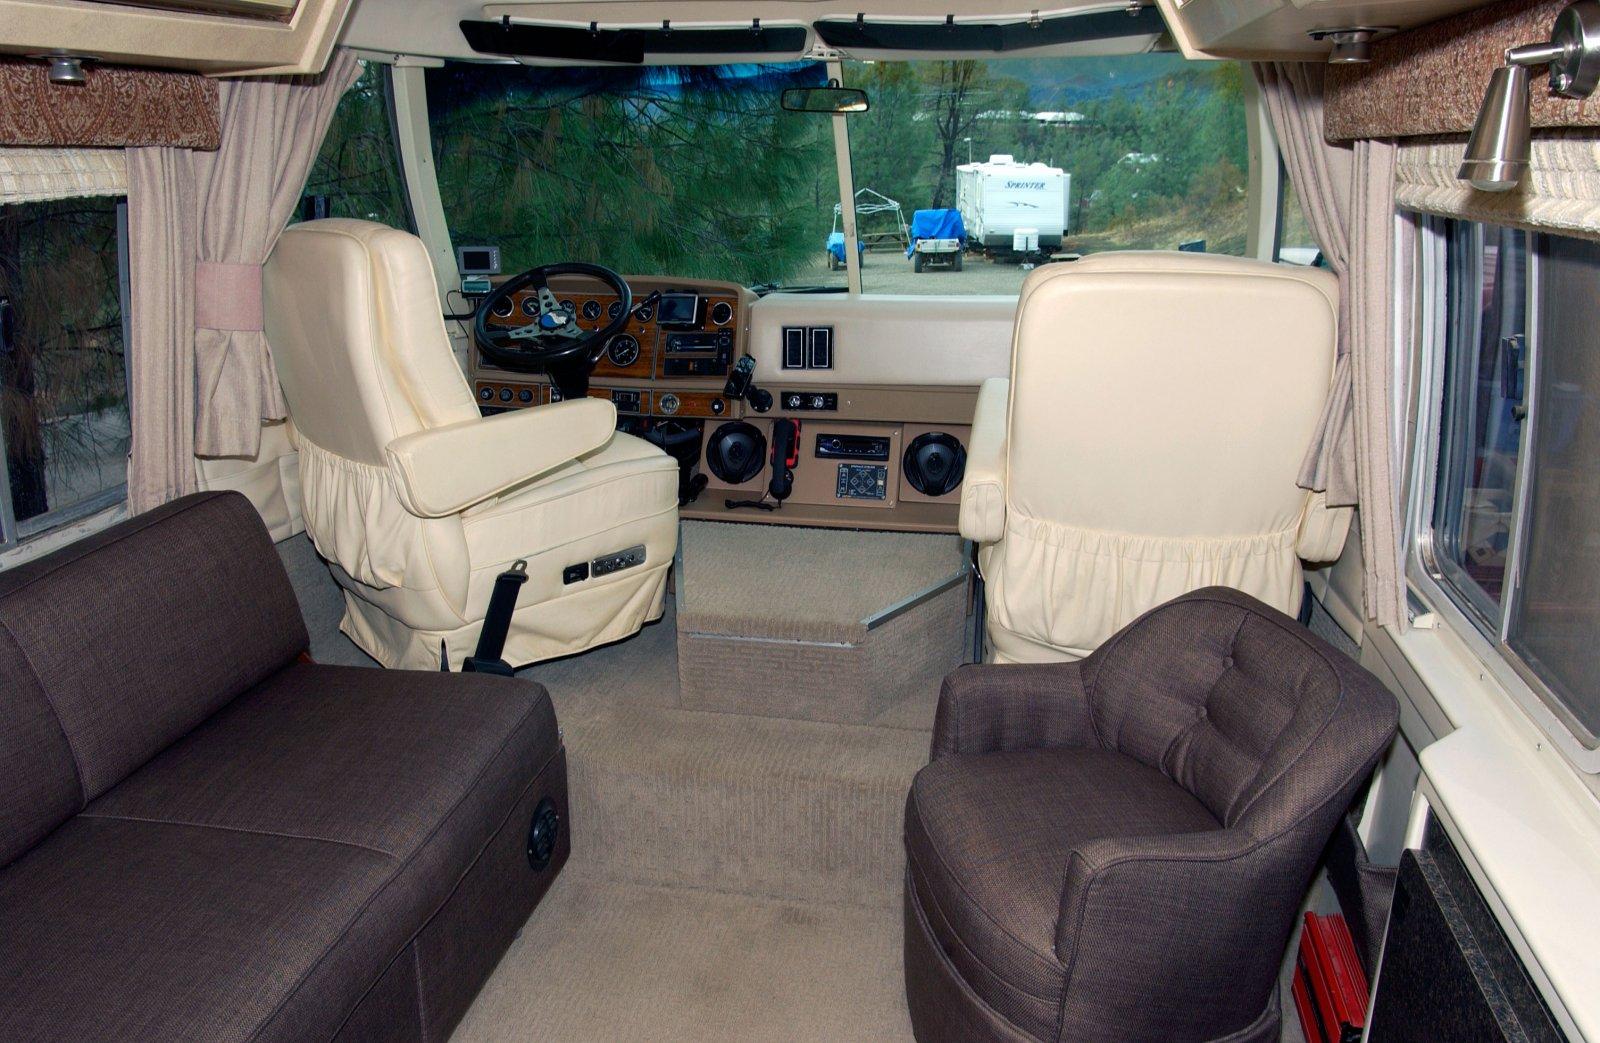 Click image for larger version  Name:Salon-Cab-web.jpg Views:89 Size:316.4 KB ID:225287